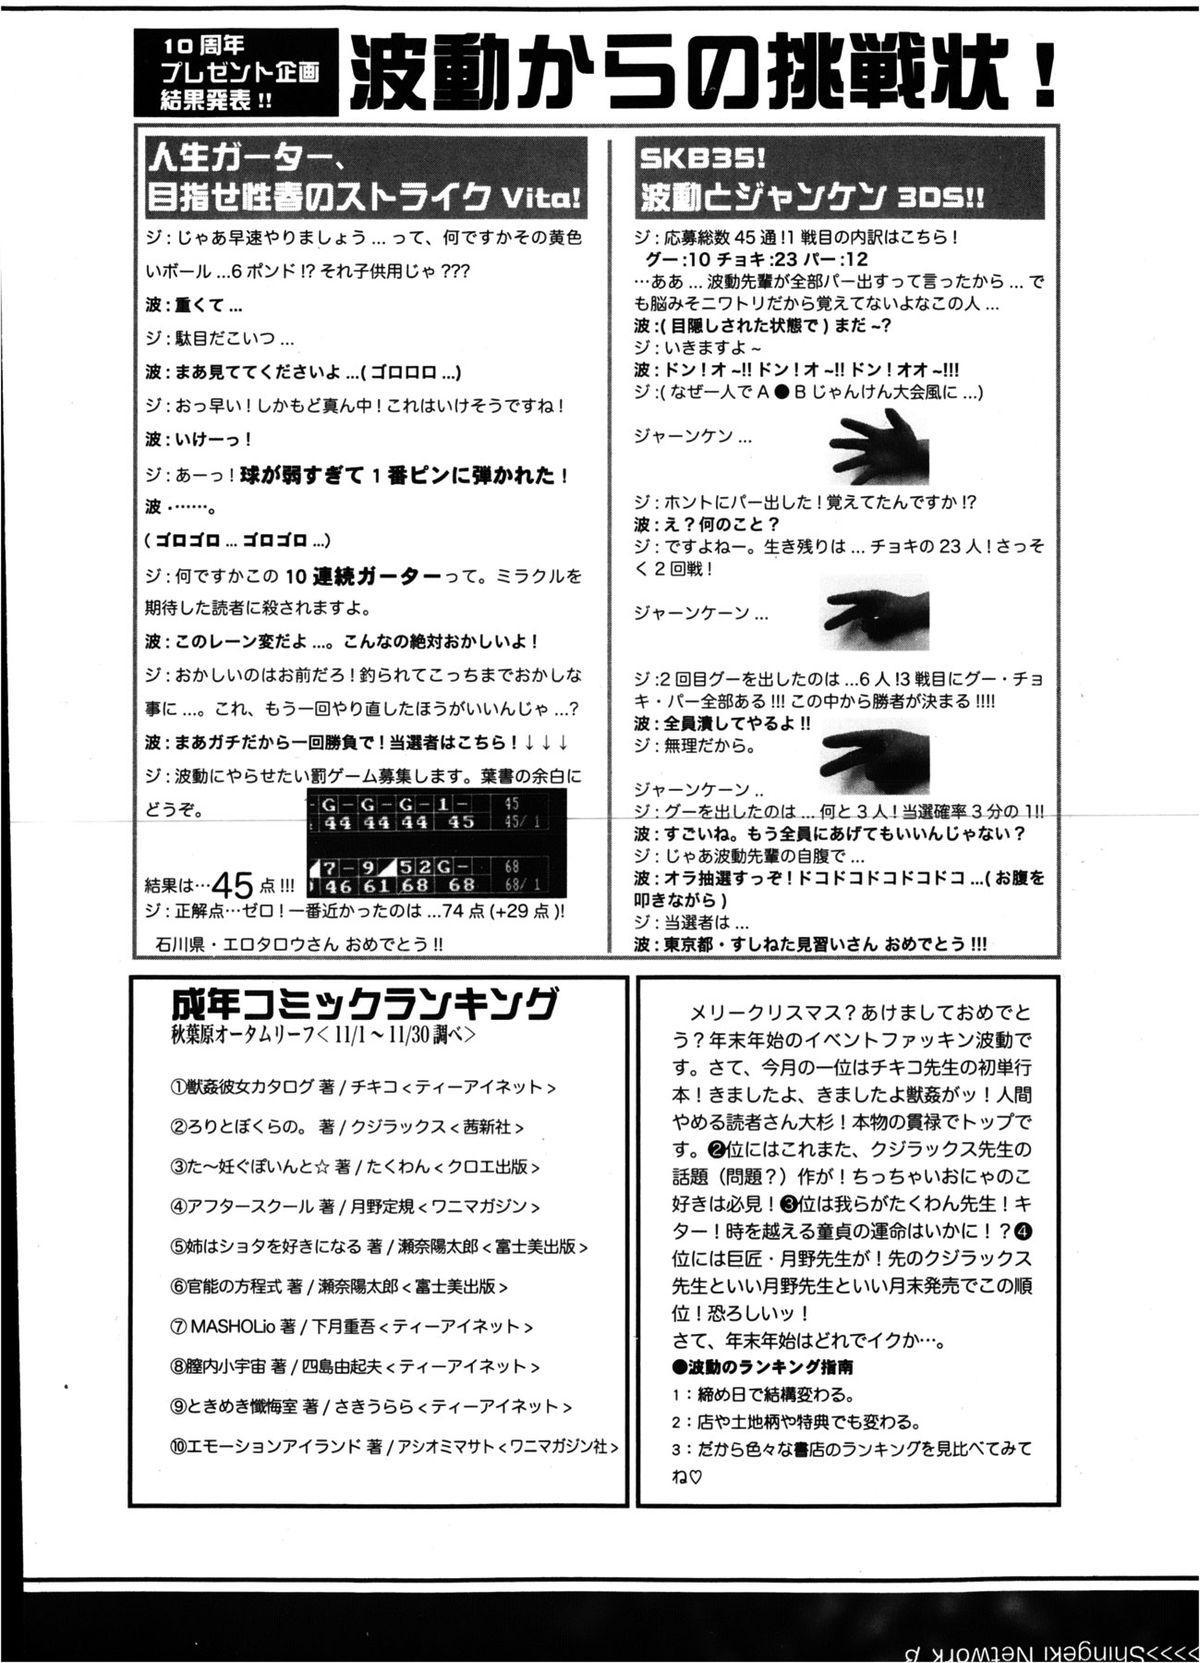 COMIC Shingeki 2013-02 363